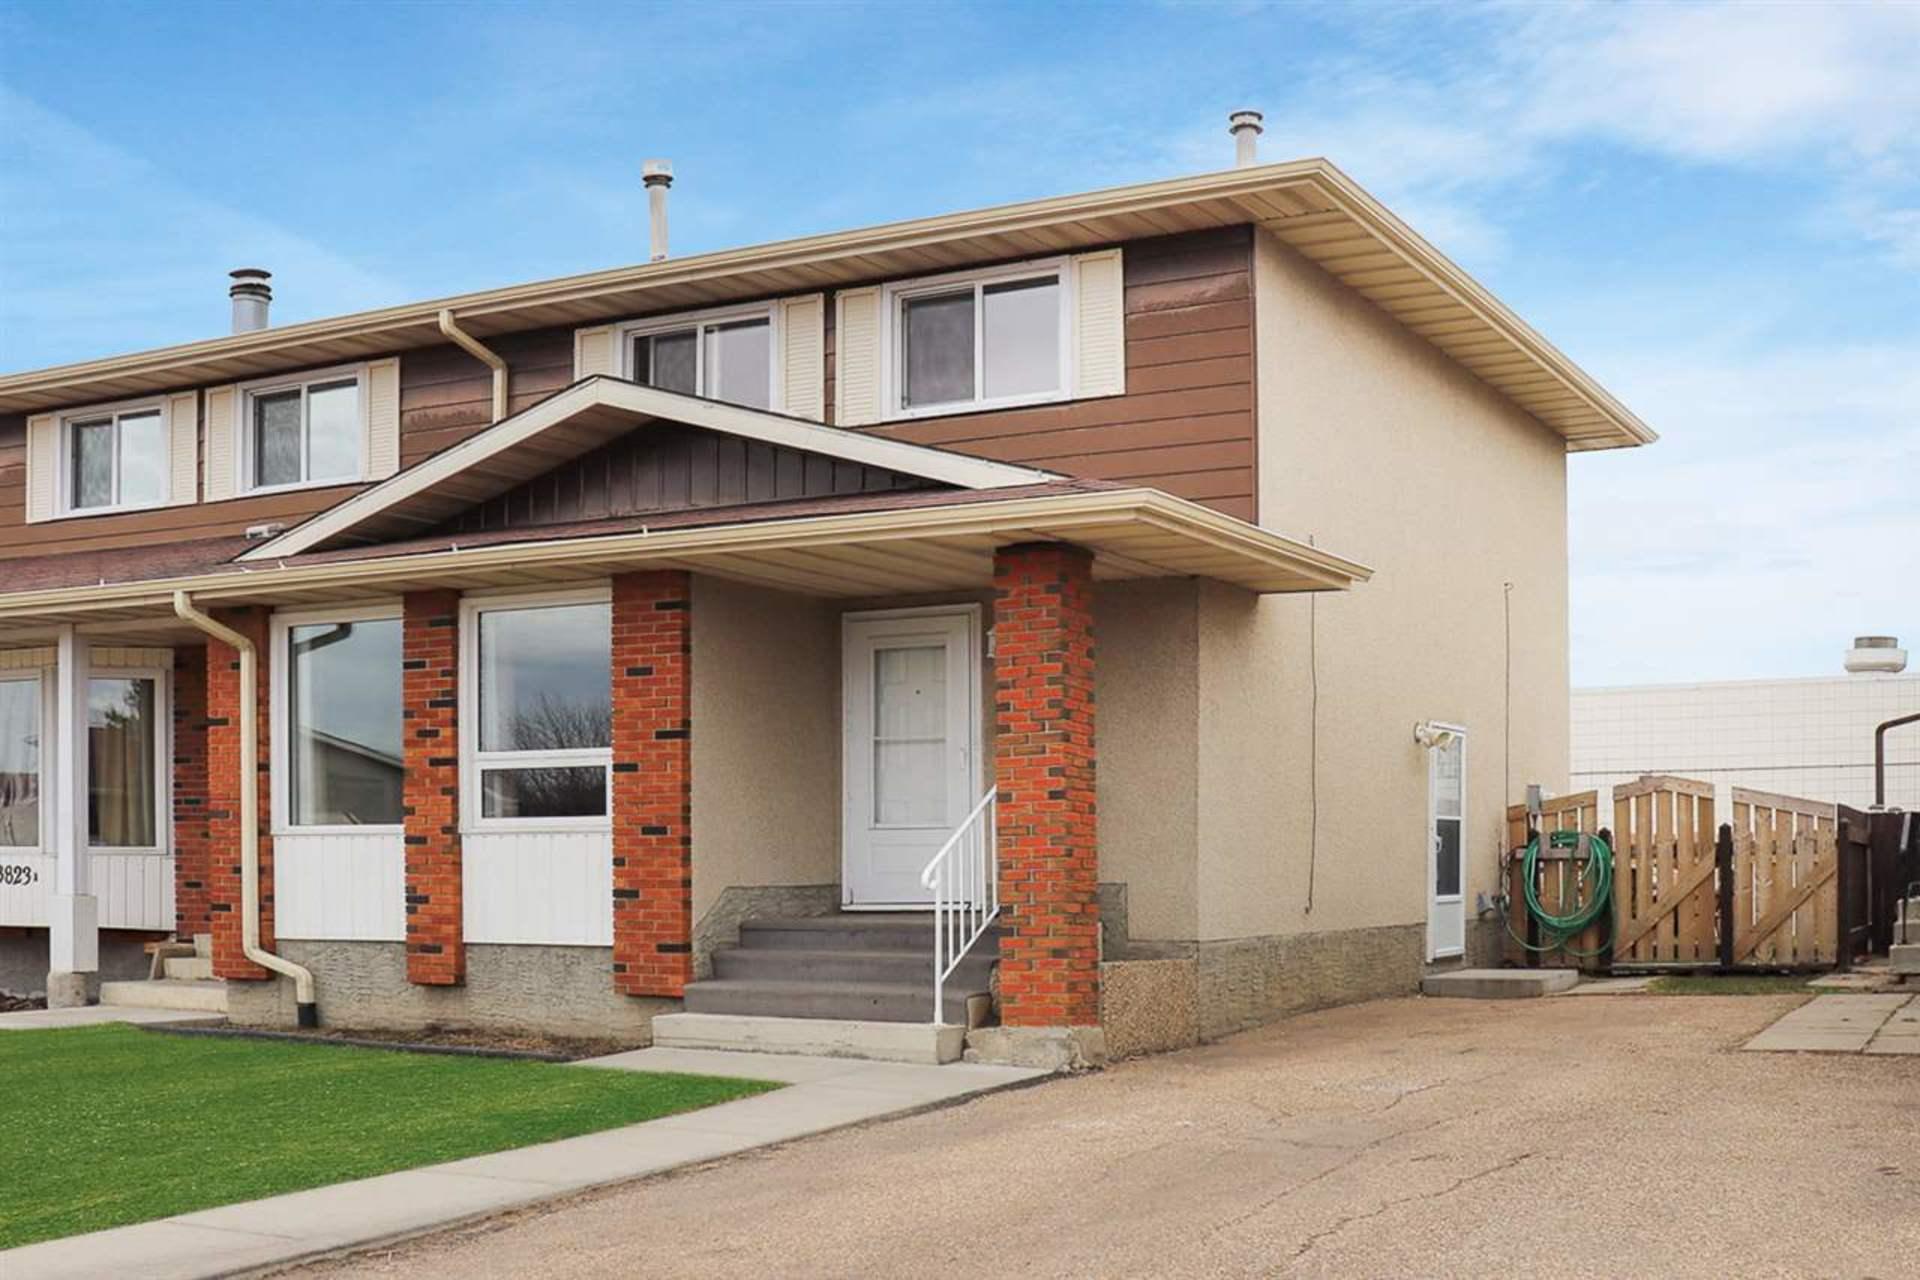 13823 114 Street, Carlisle, Edmonton